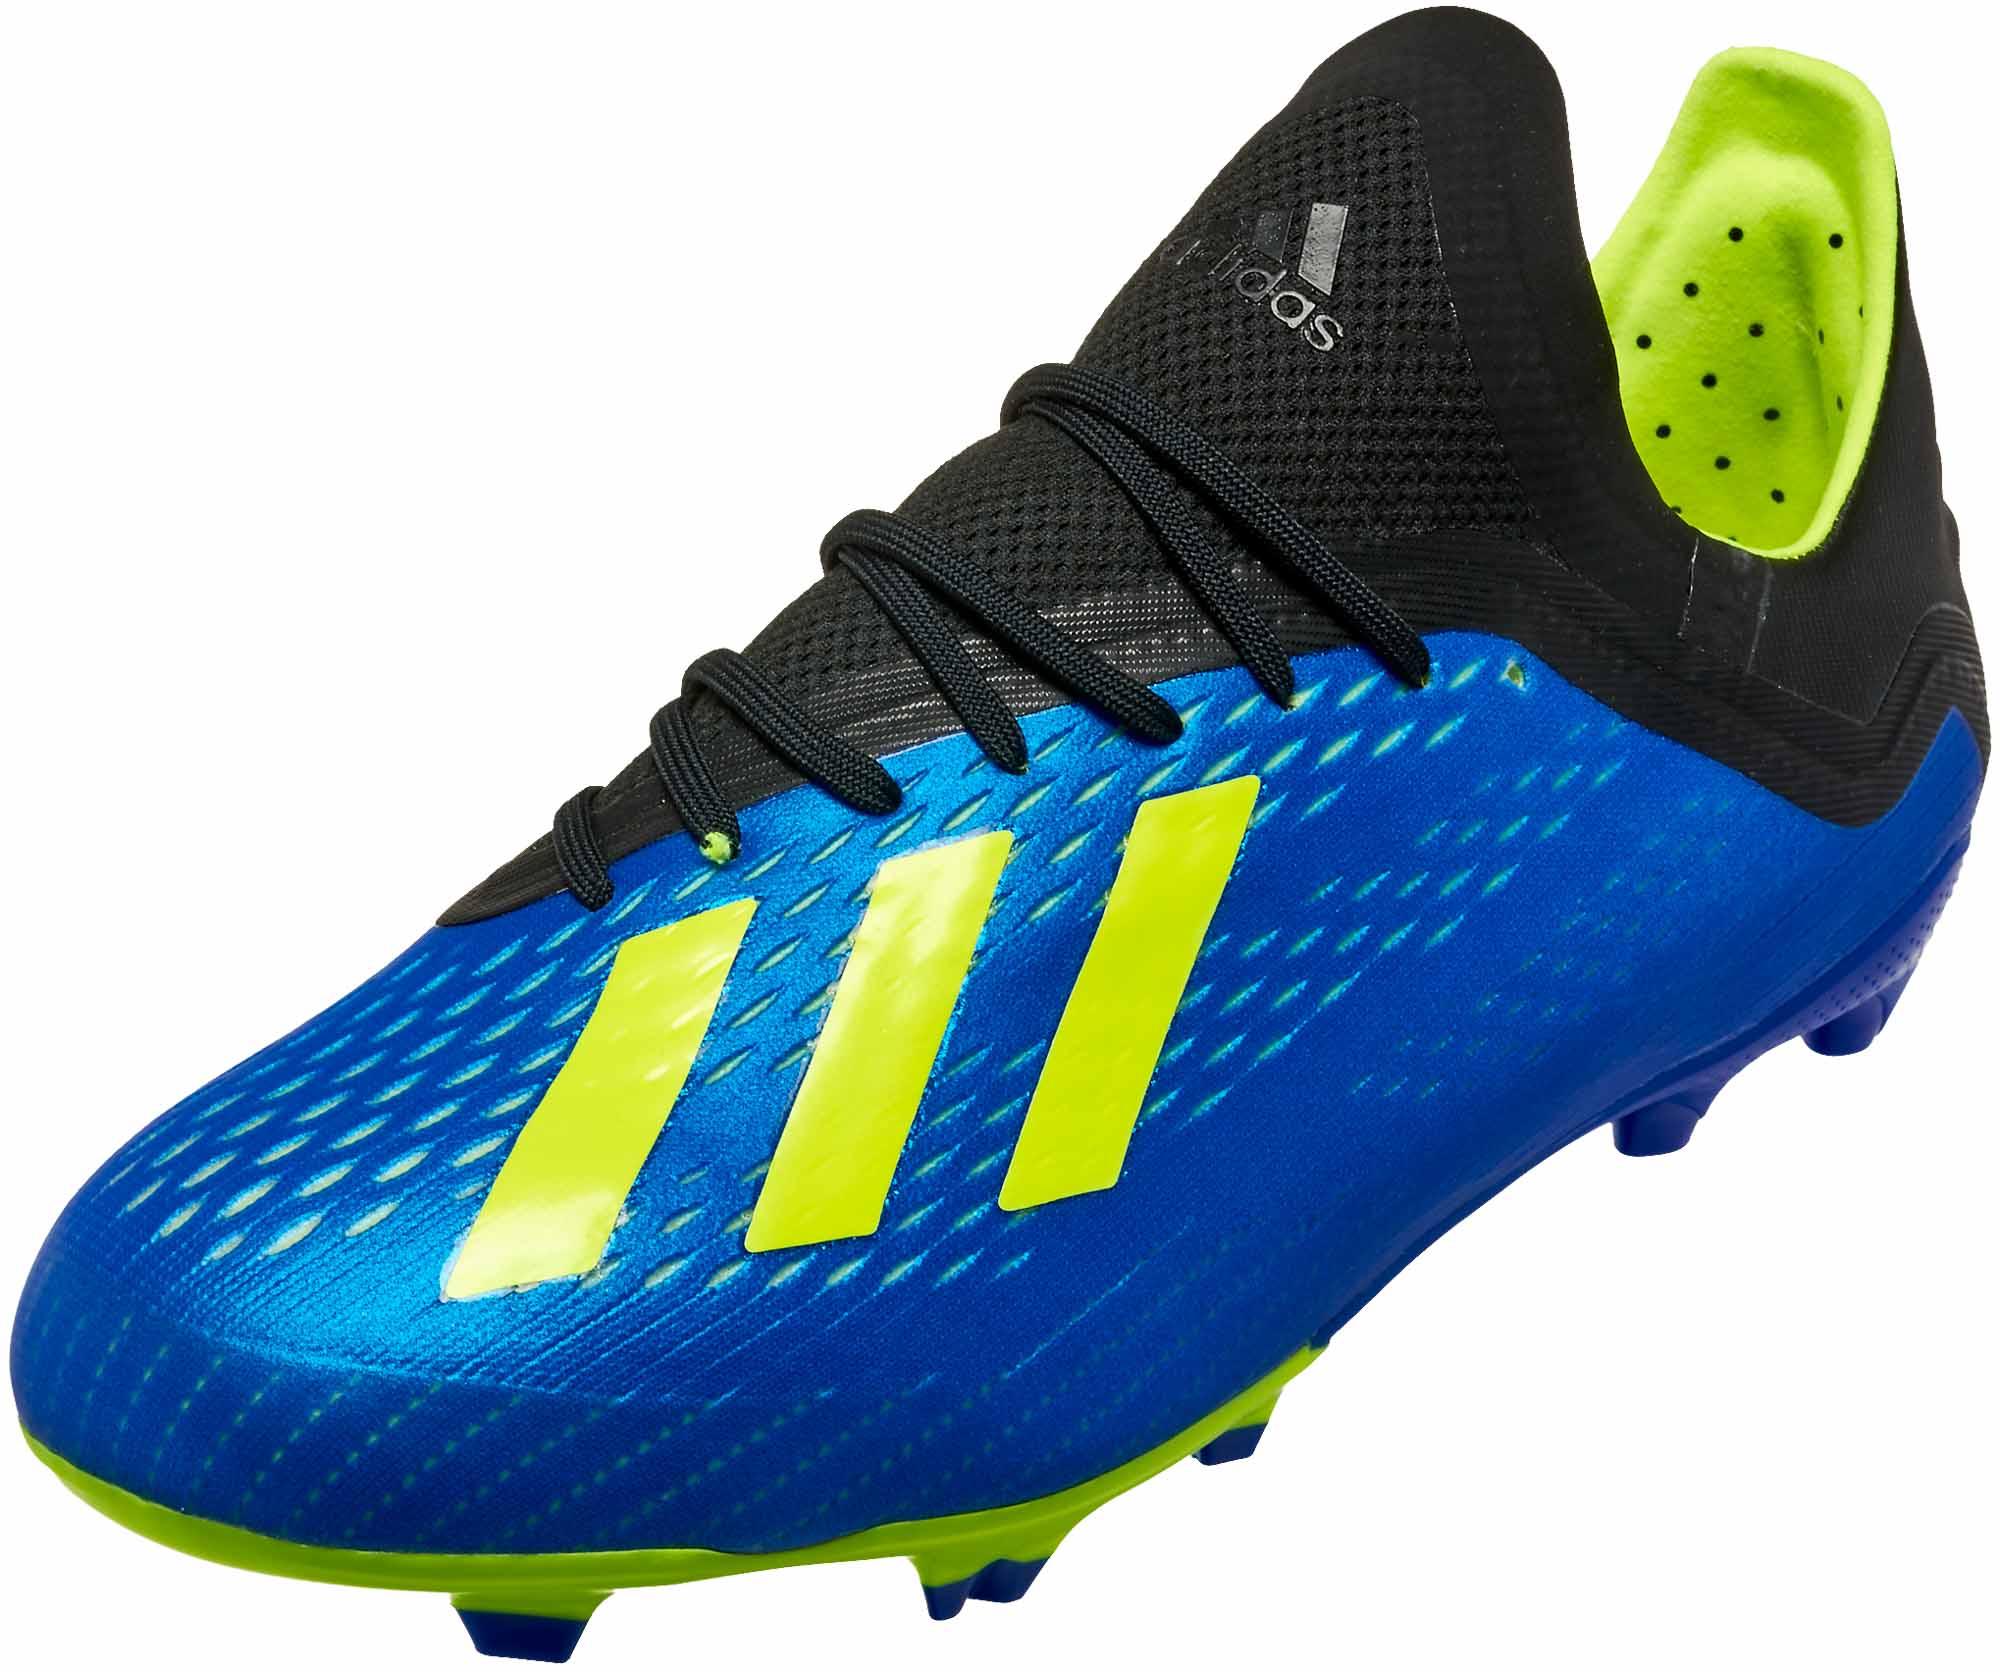 9e5696bfa Youth adidas X 18.1 FG - Football Blue adidas cleats - SoccerPro.com